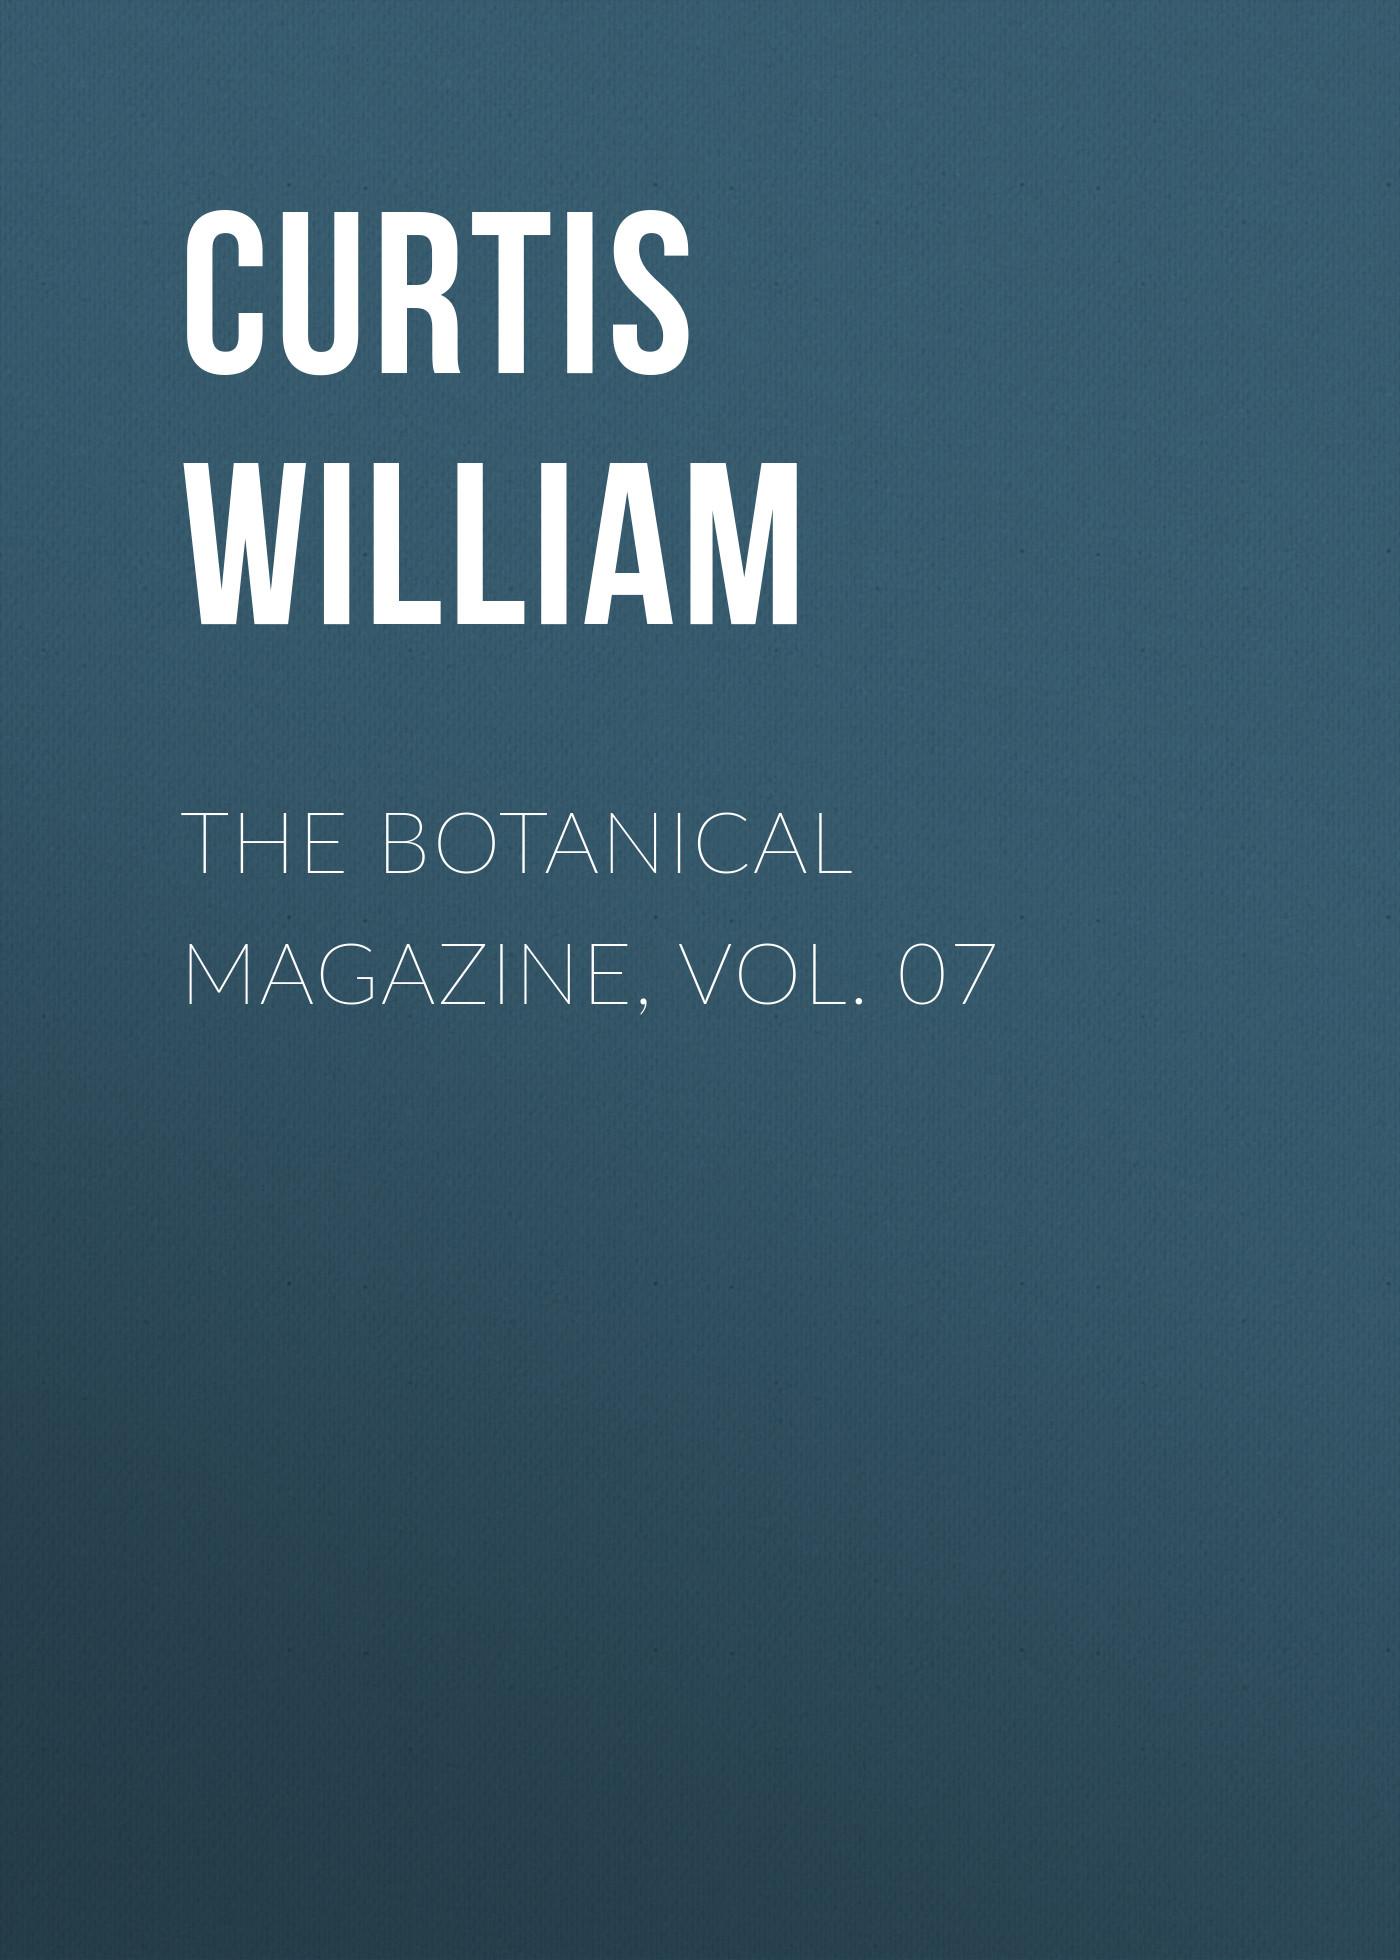 Curtis William The Botanical Magazine, Vol. 07 george curtis the last realm